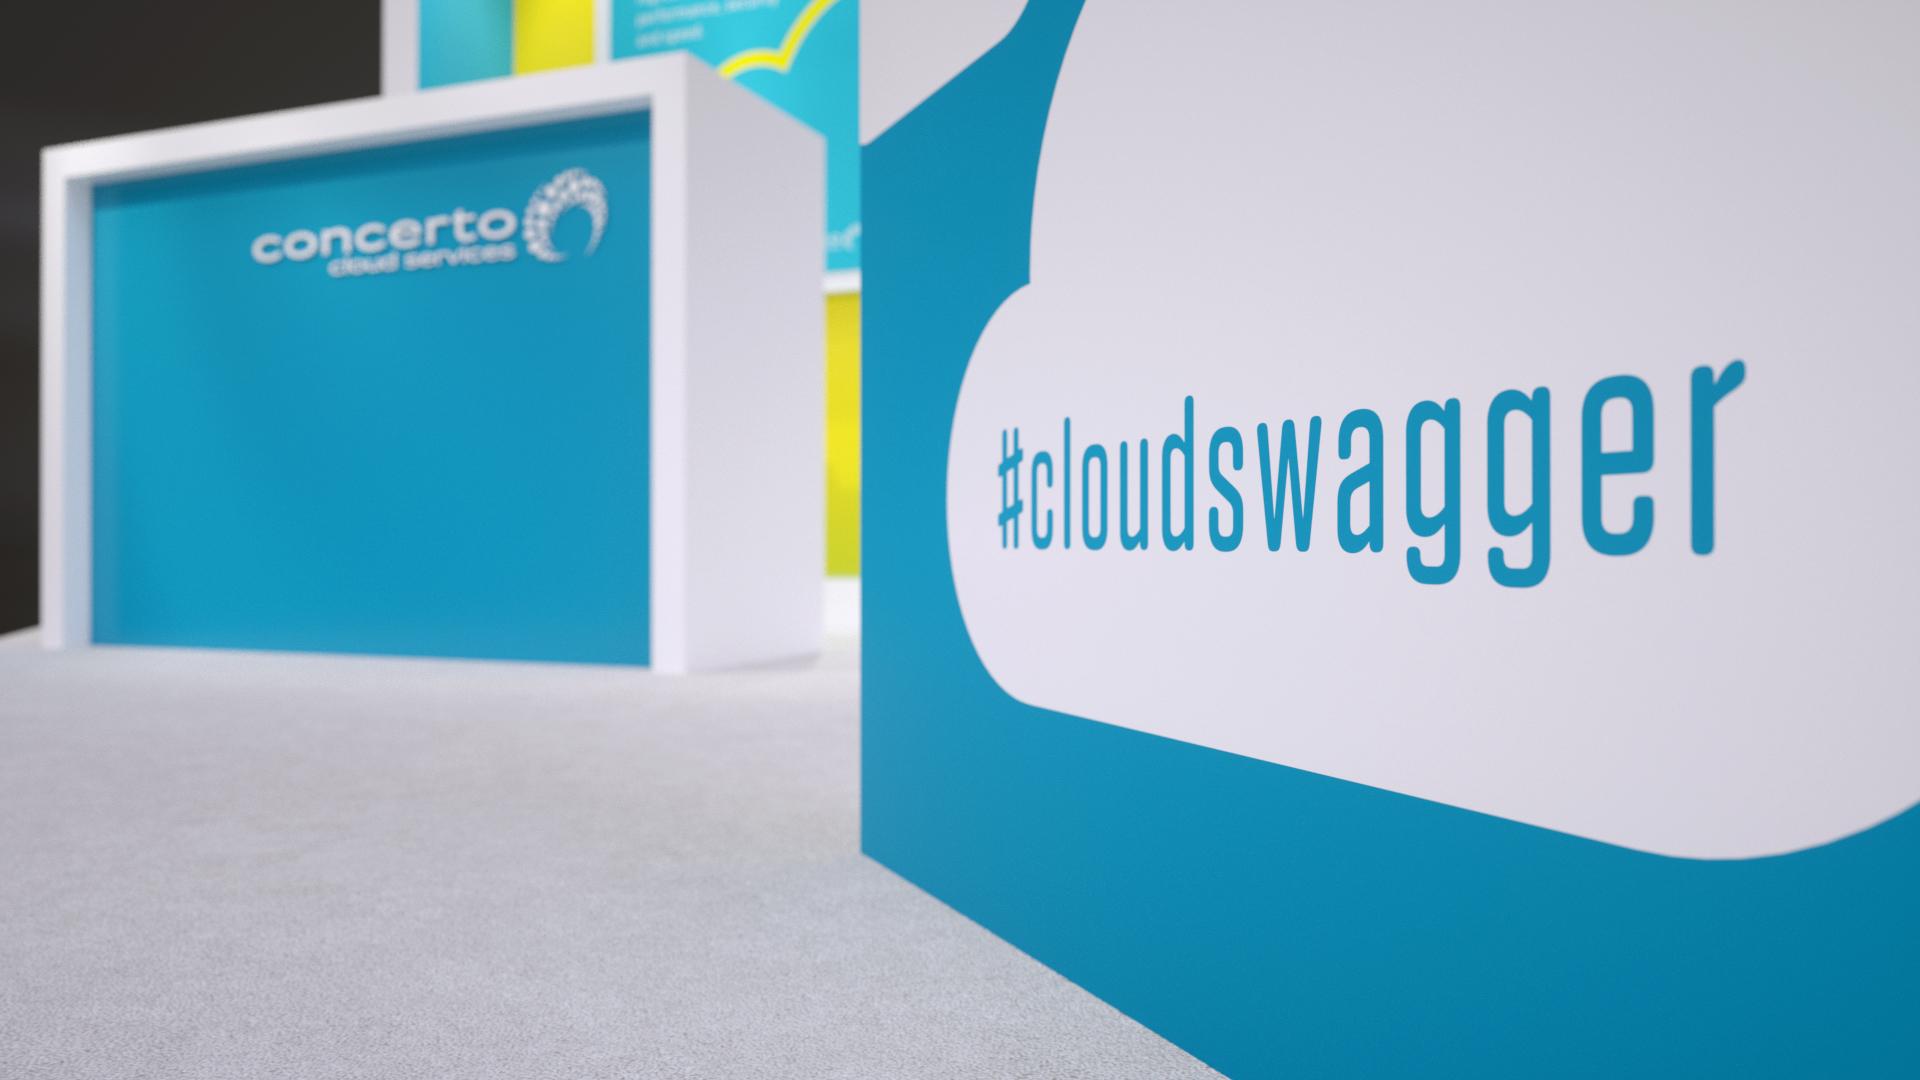 3053 - Concerto Cloud Services - Microsoft Envision 2016 - View 11.jpg